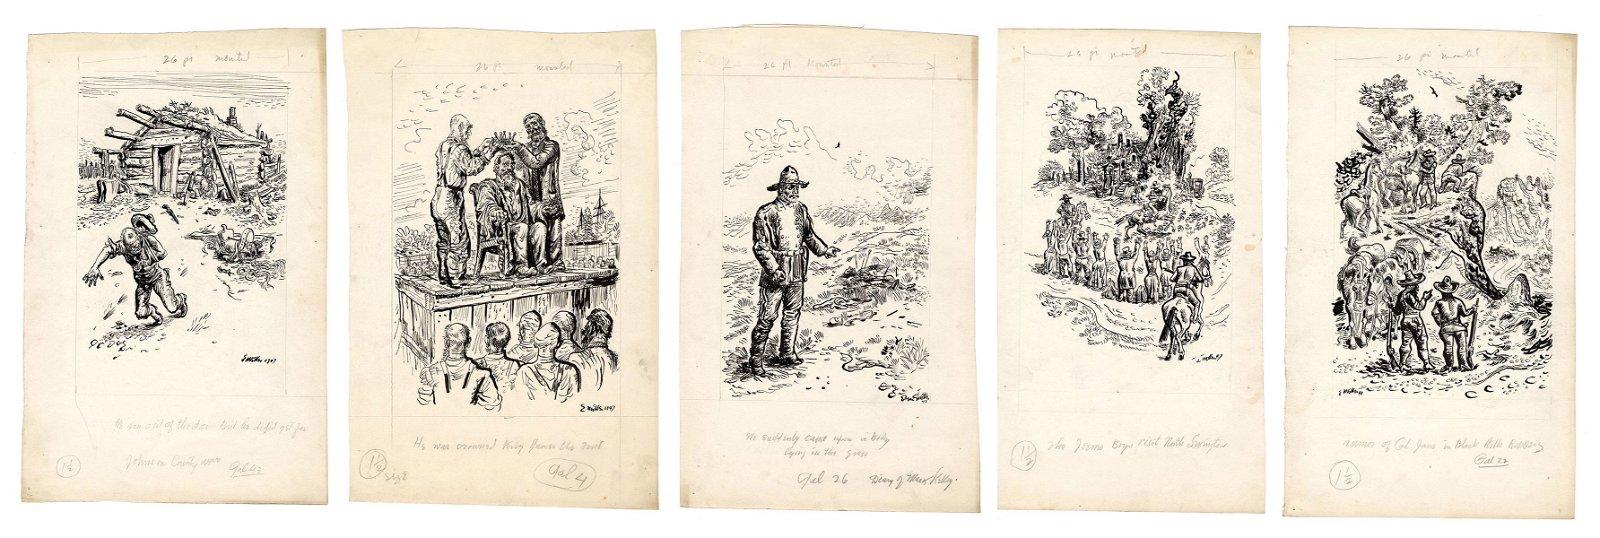 Western Themed Original Illustration Art. 1947. Five